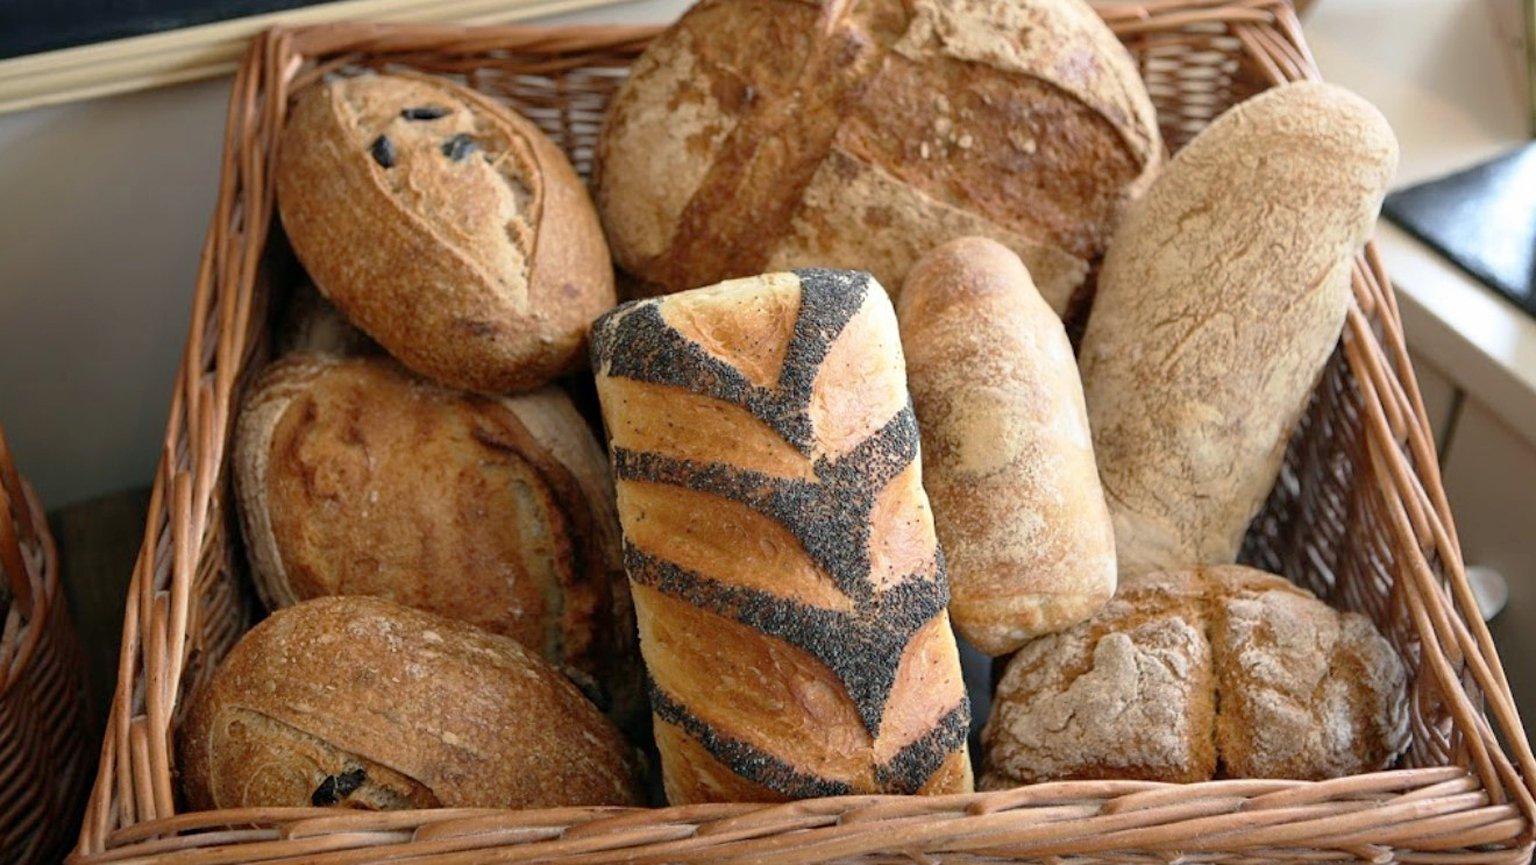 Holtwhites Bakery & Deli cover image